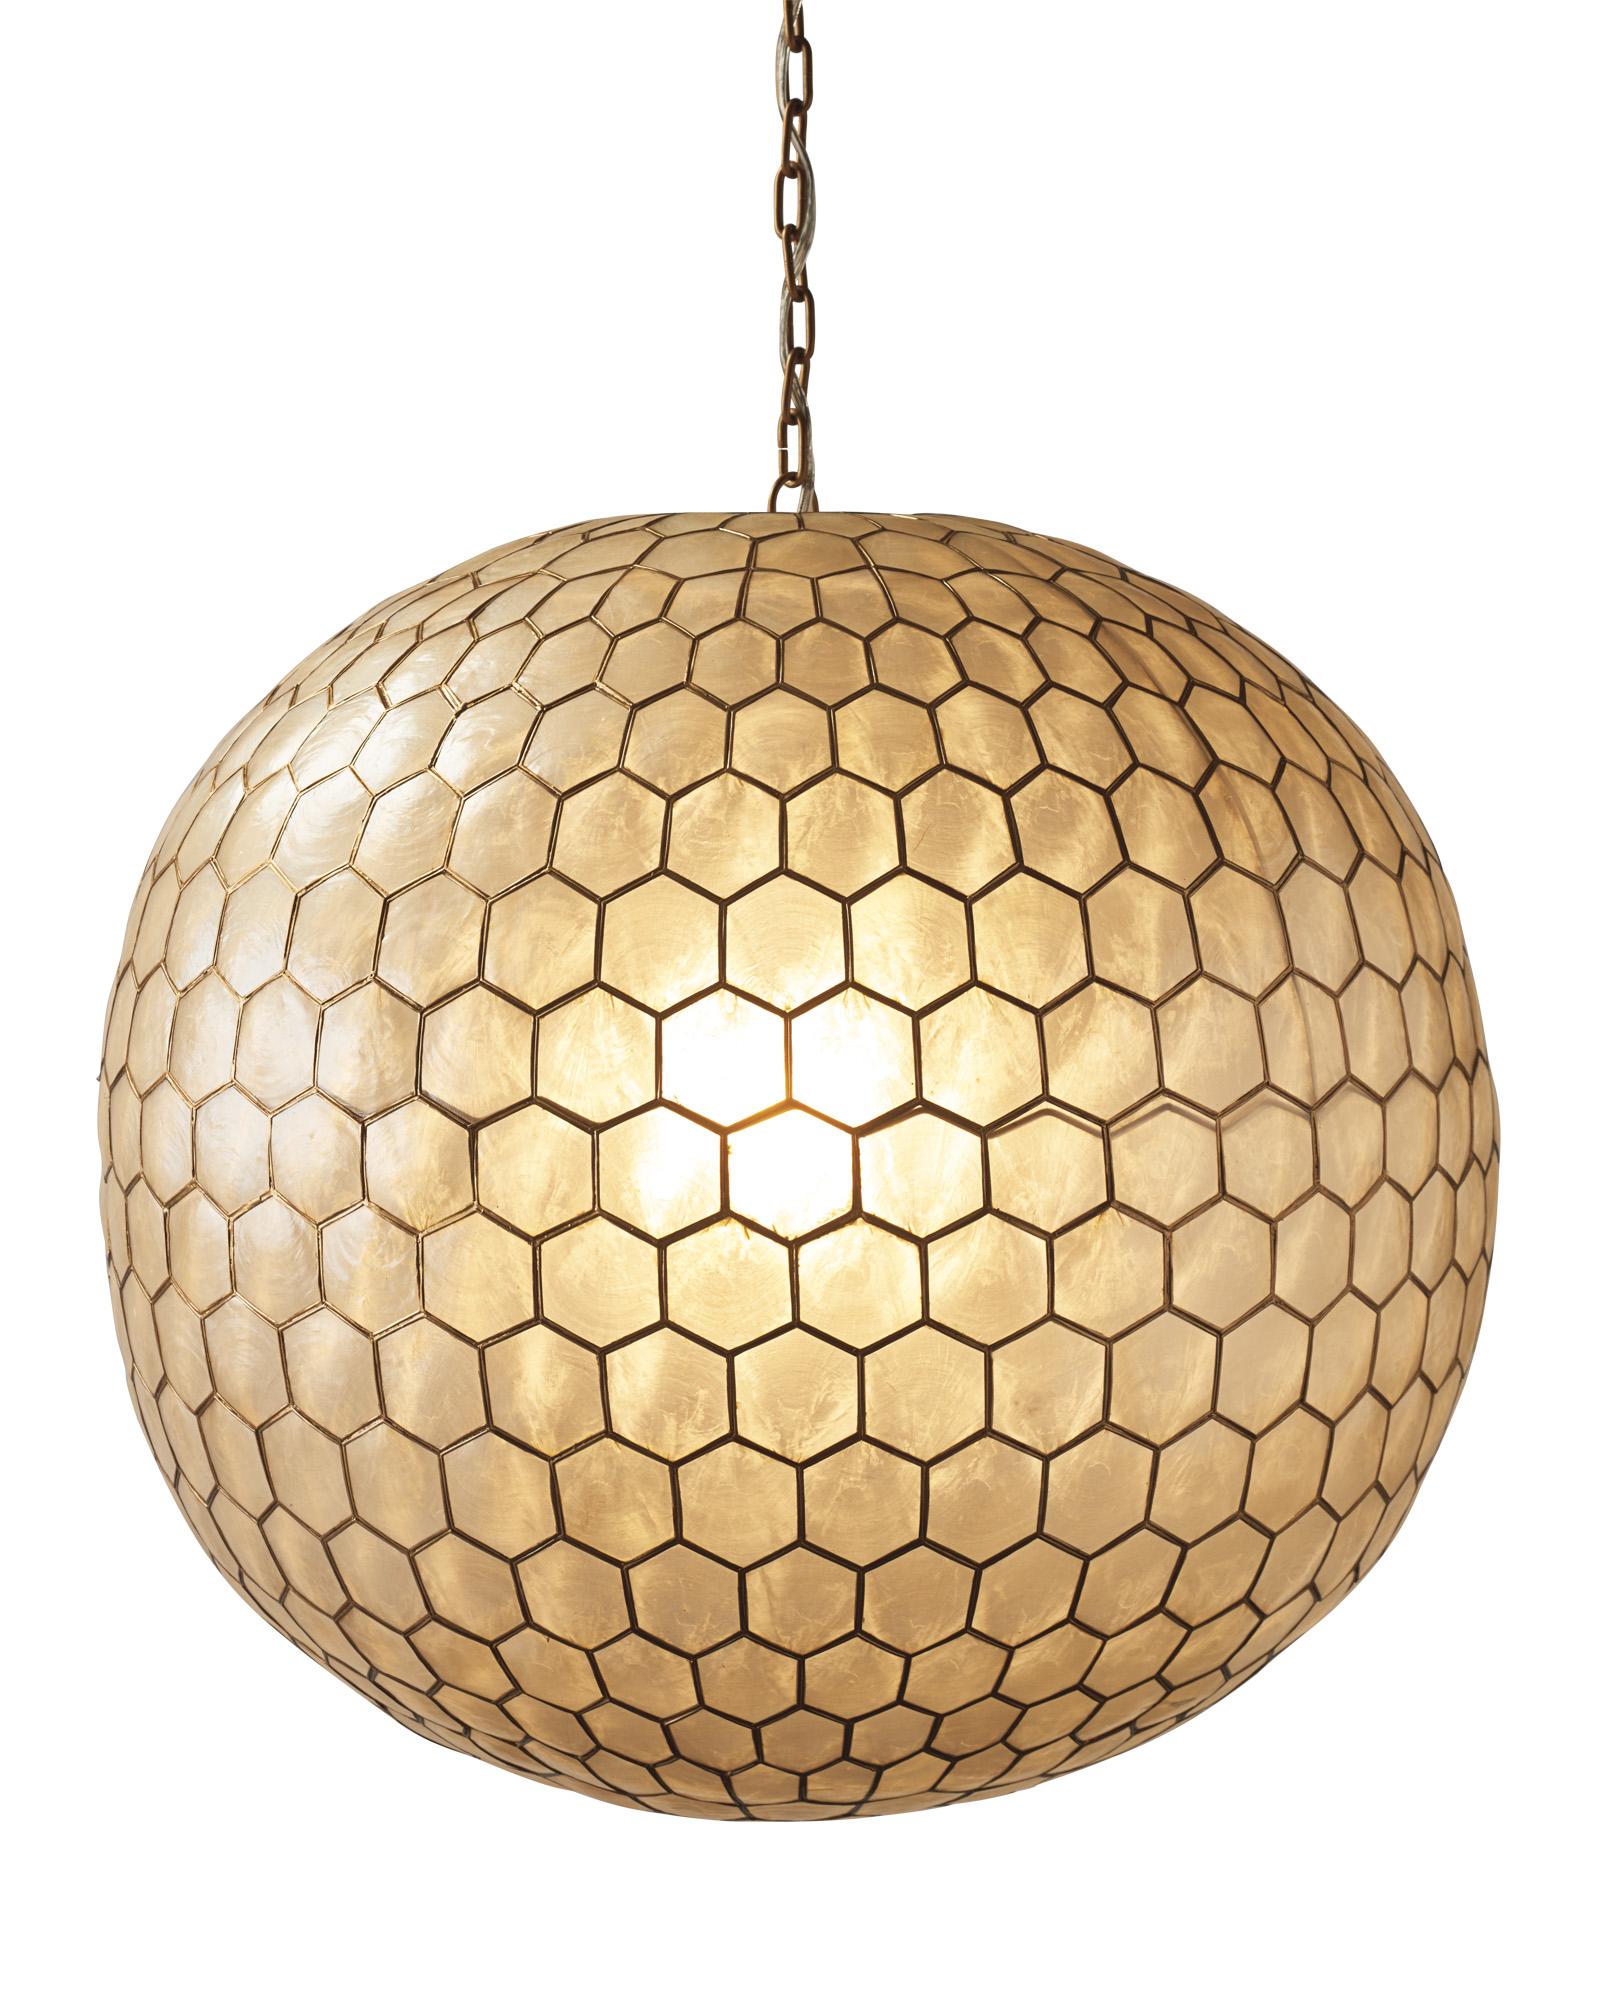 Capiz Honeycomb Chandelier - Large